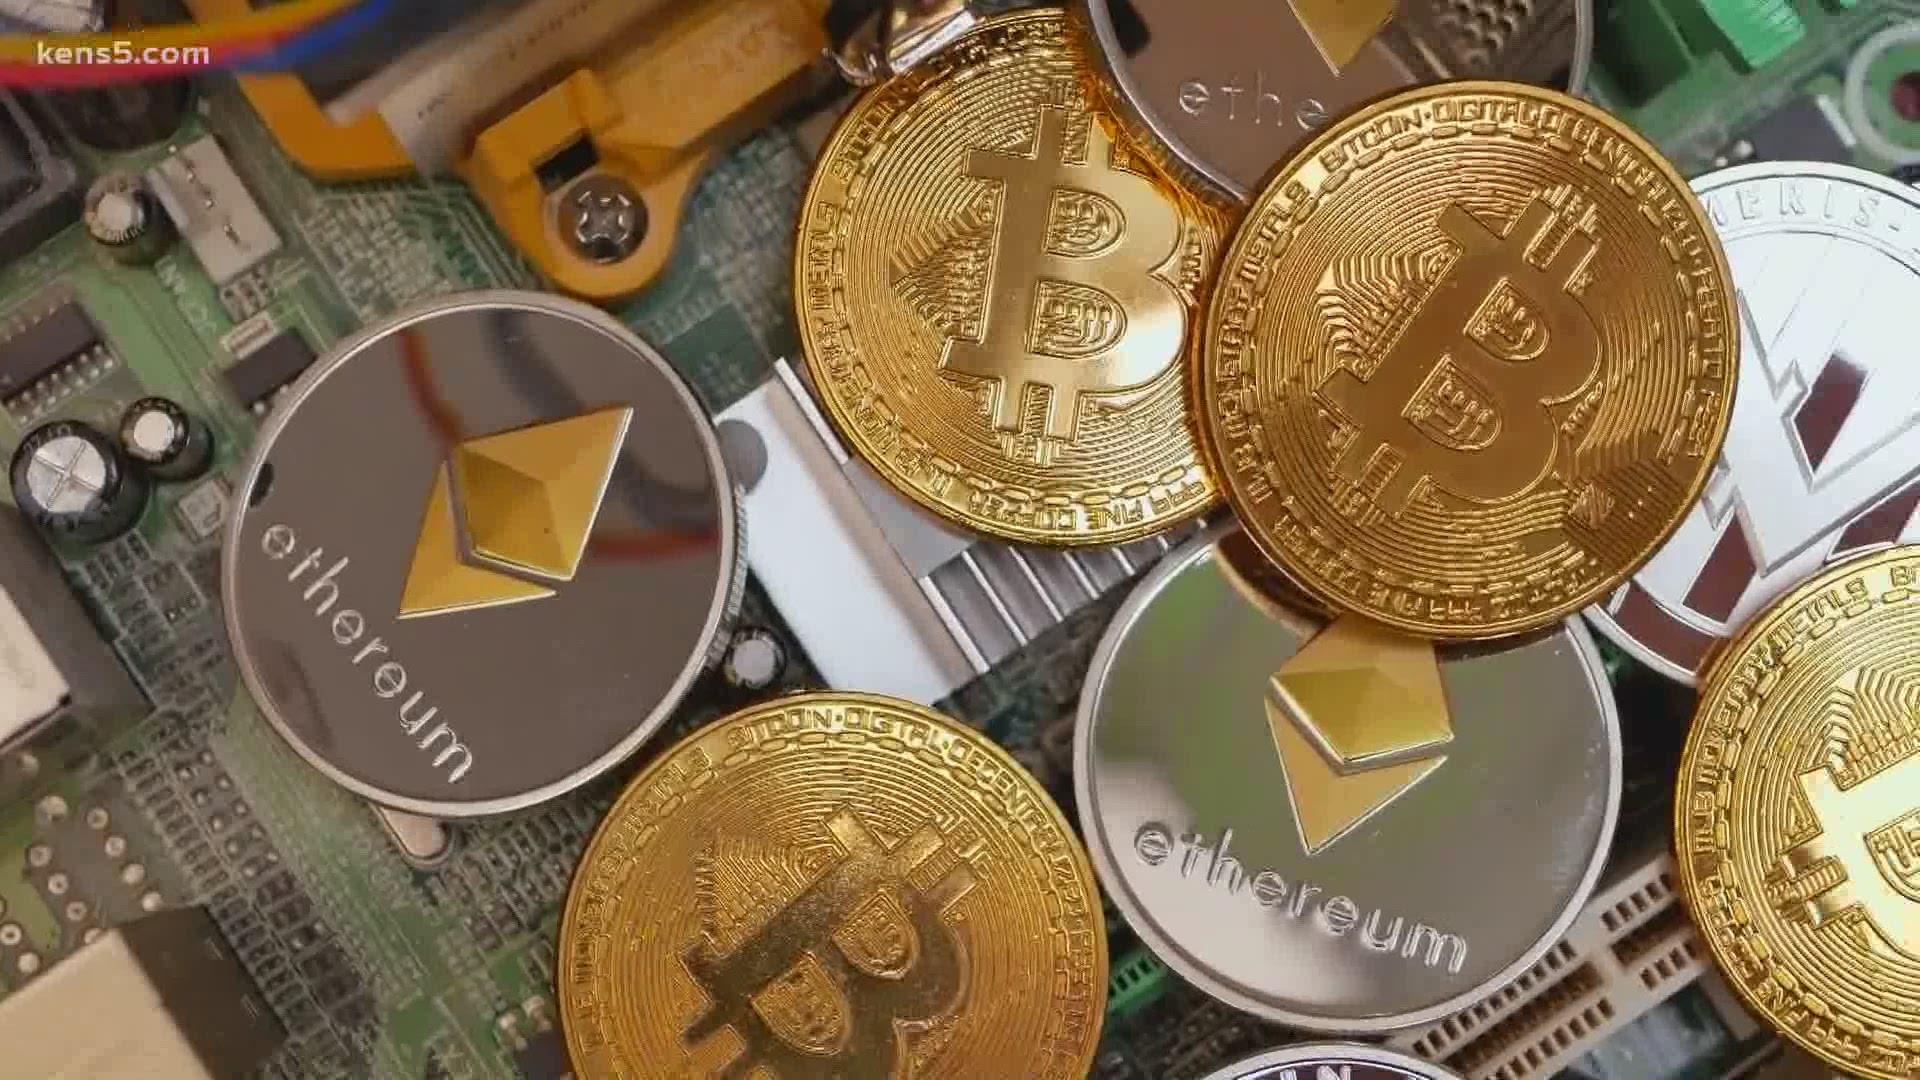 tien ao bitcoin wie ist sicher bitcoin commerciante